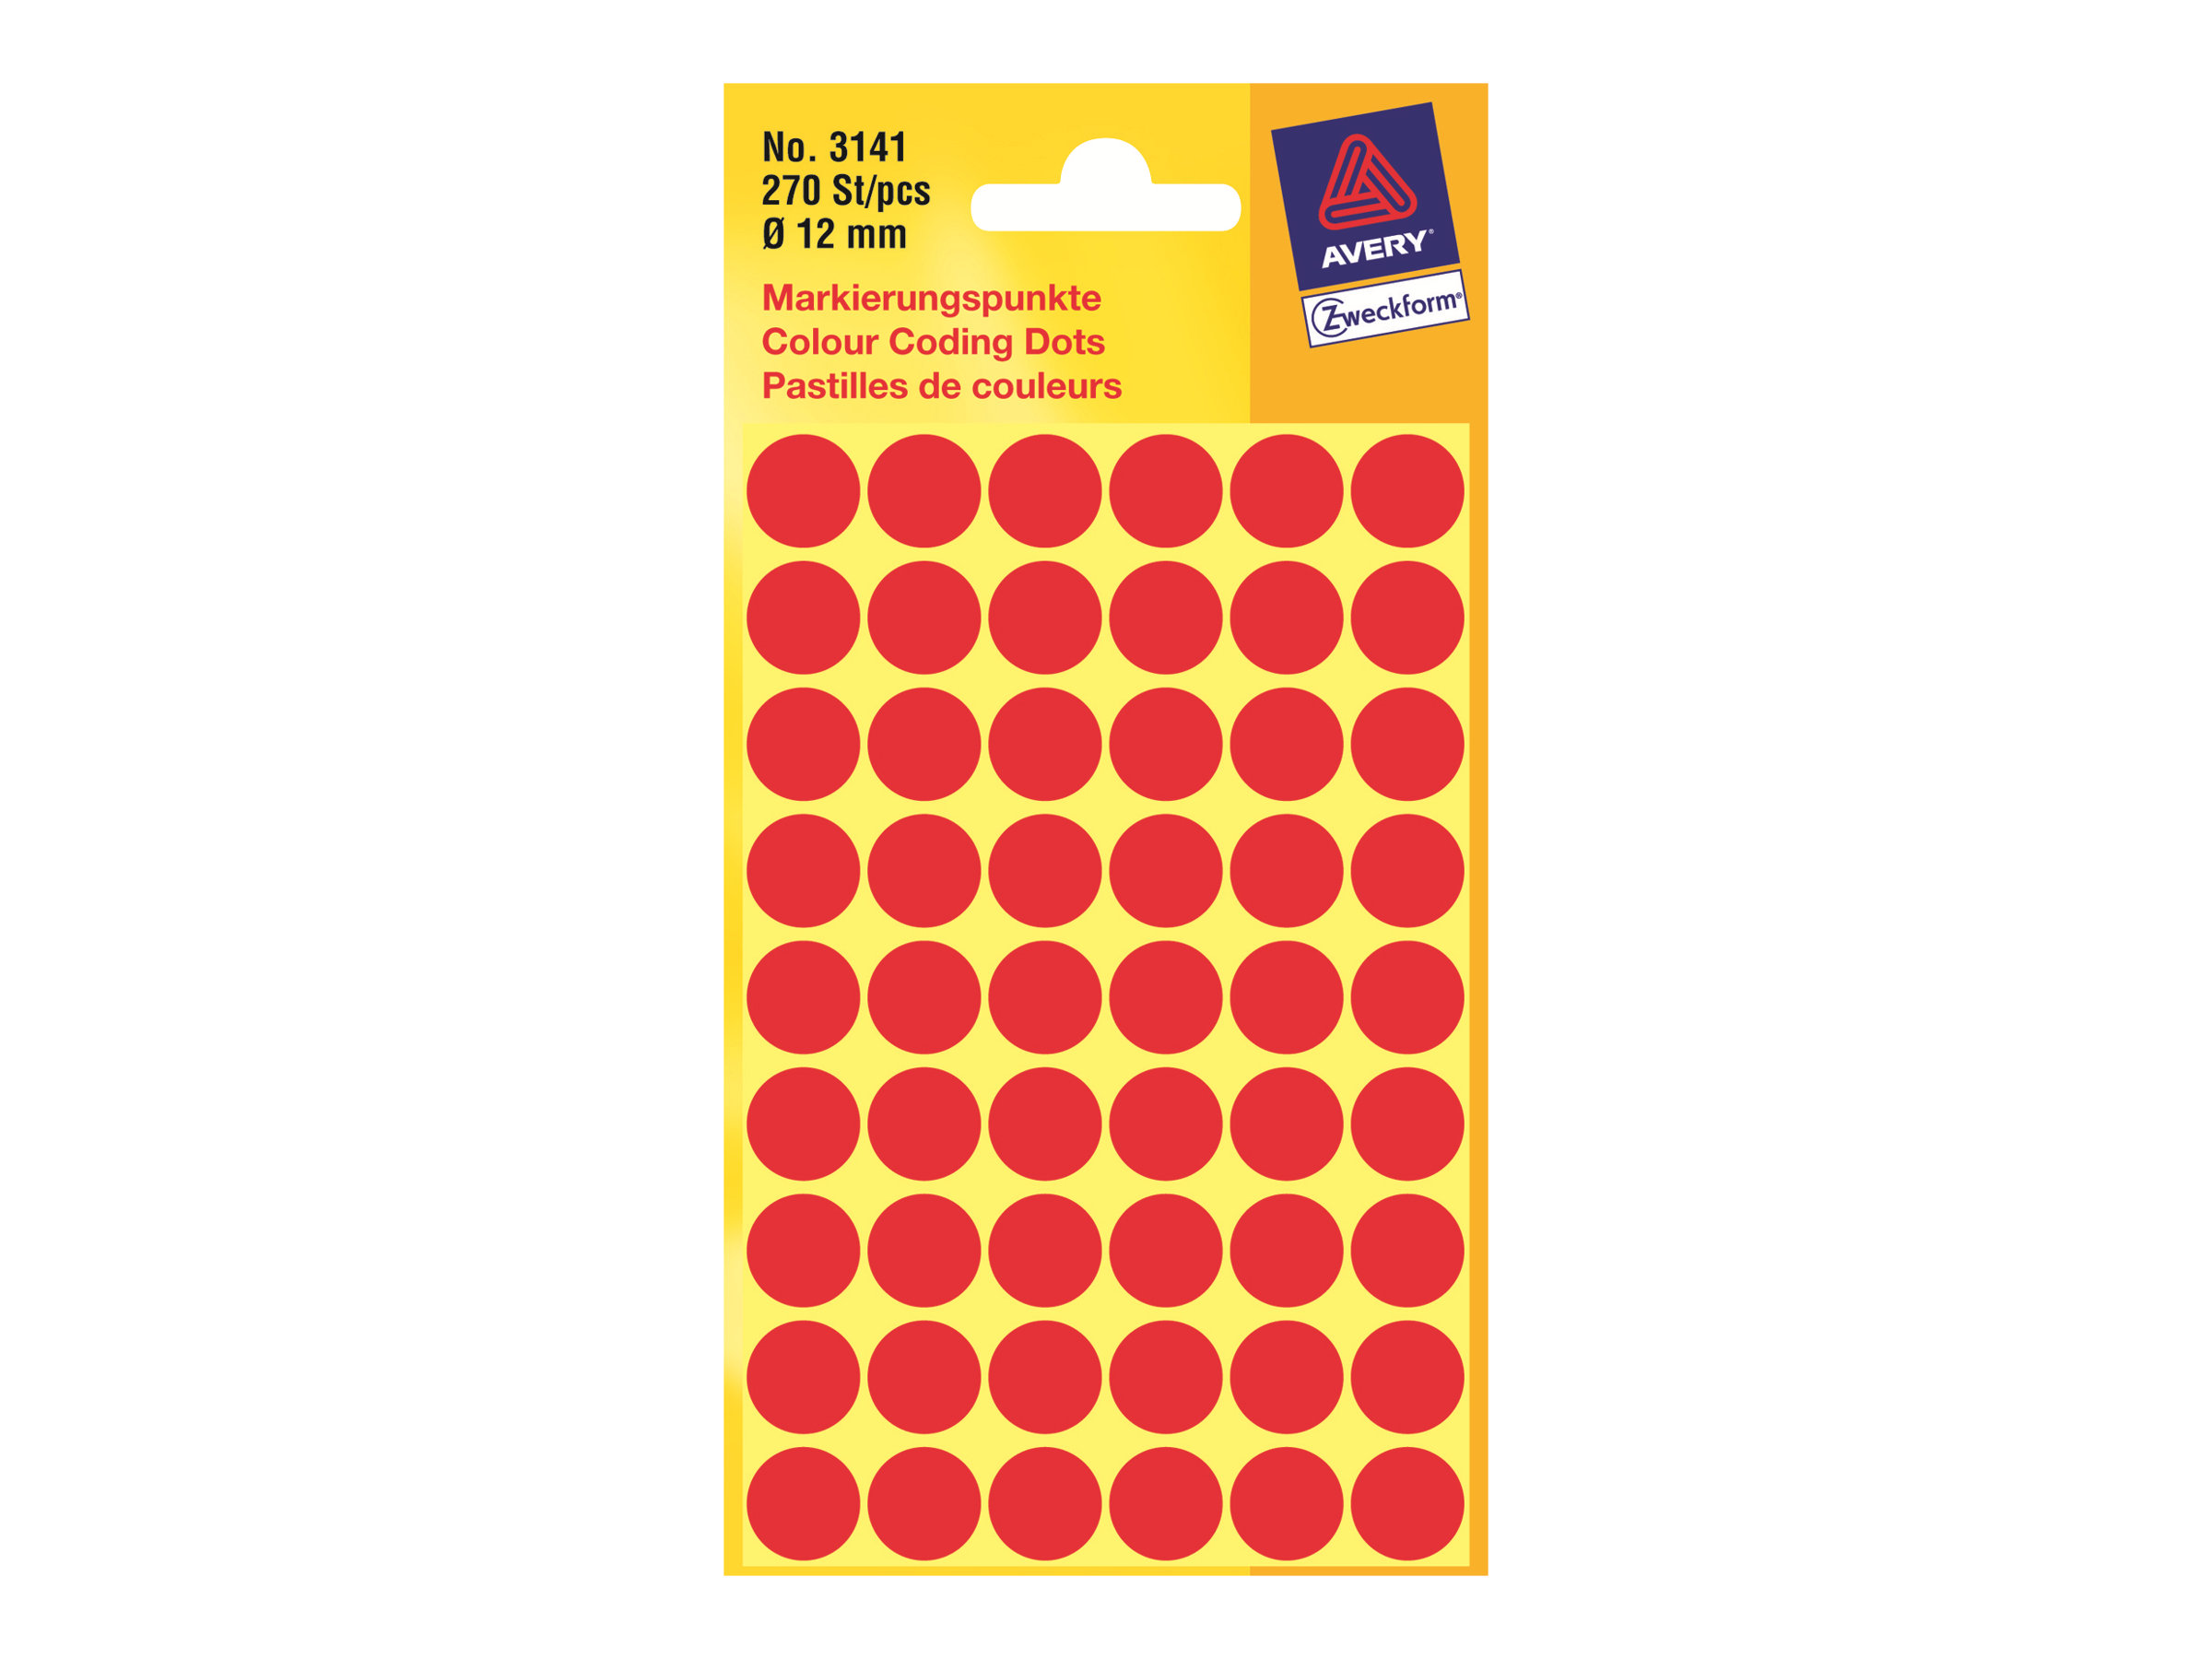 Avery Zweckform 3141 - Permanenter Klebstoff - Rot - 12 mm rund 270 Etikett(en) (5 Bogen x 54)